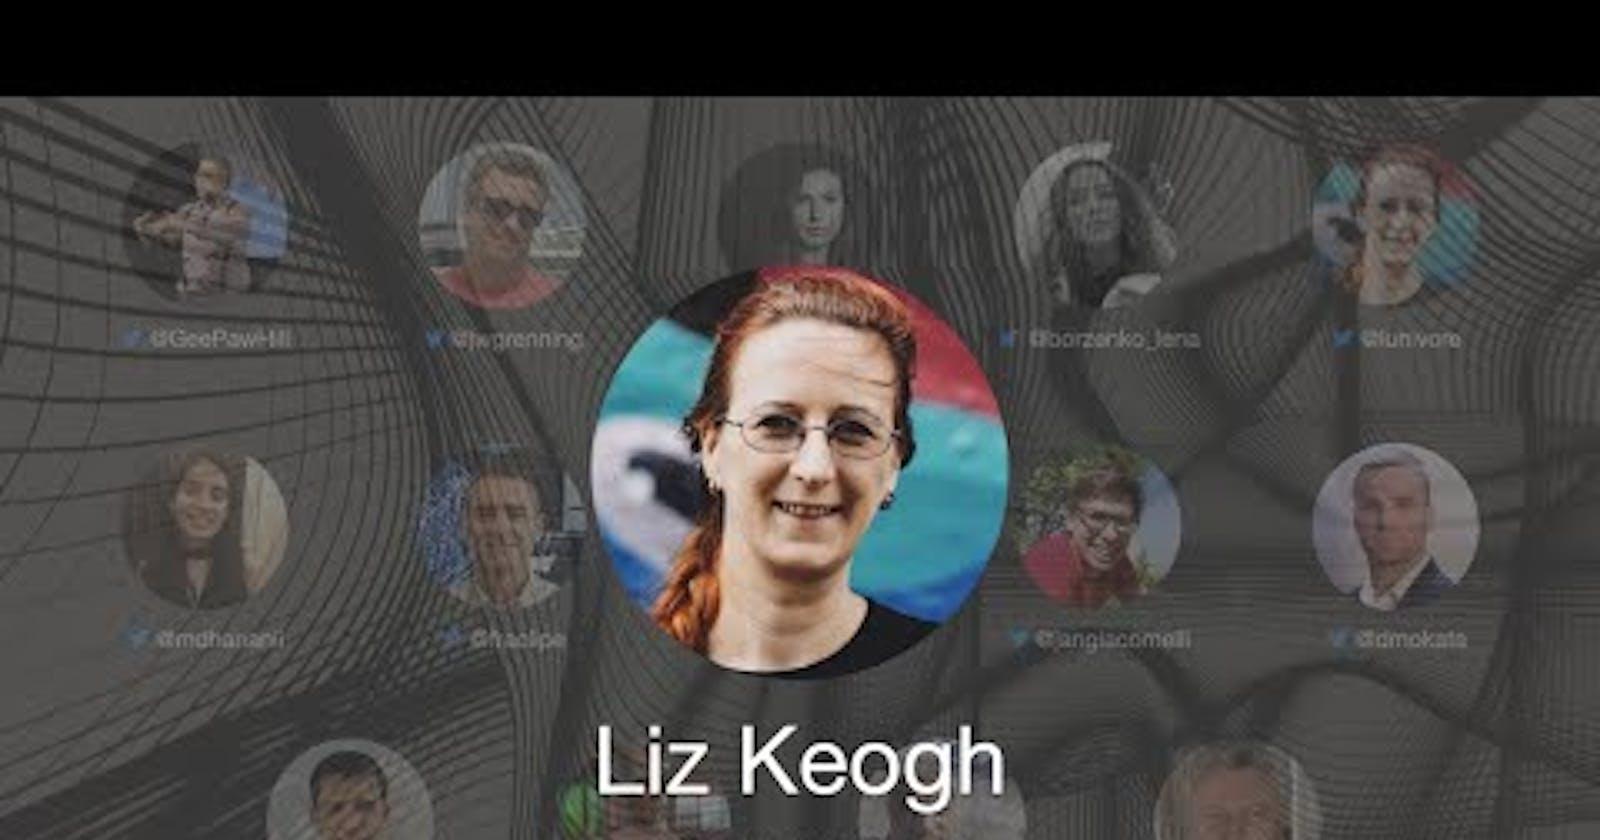 TDD Conference 2021 - TDD All The Things - Liz Keogh